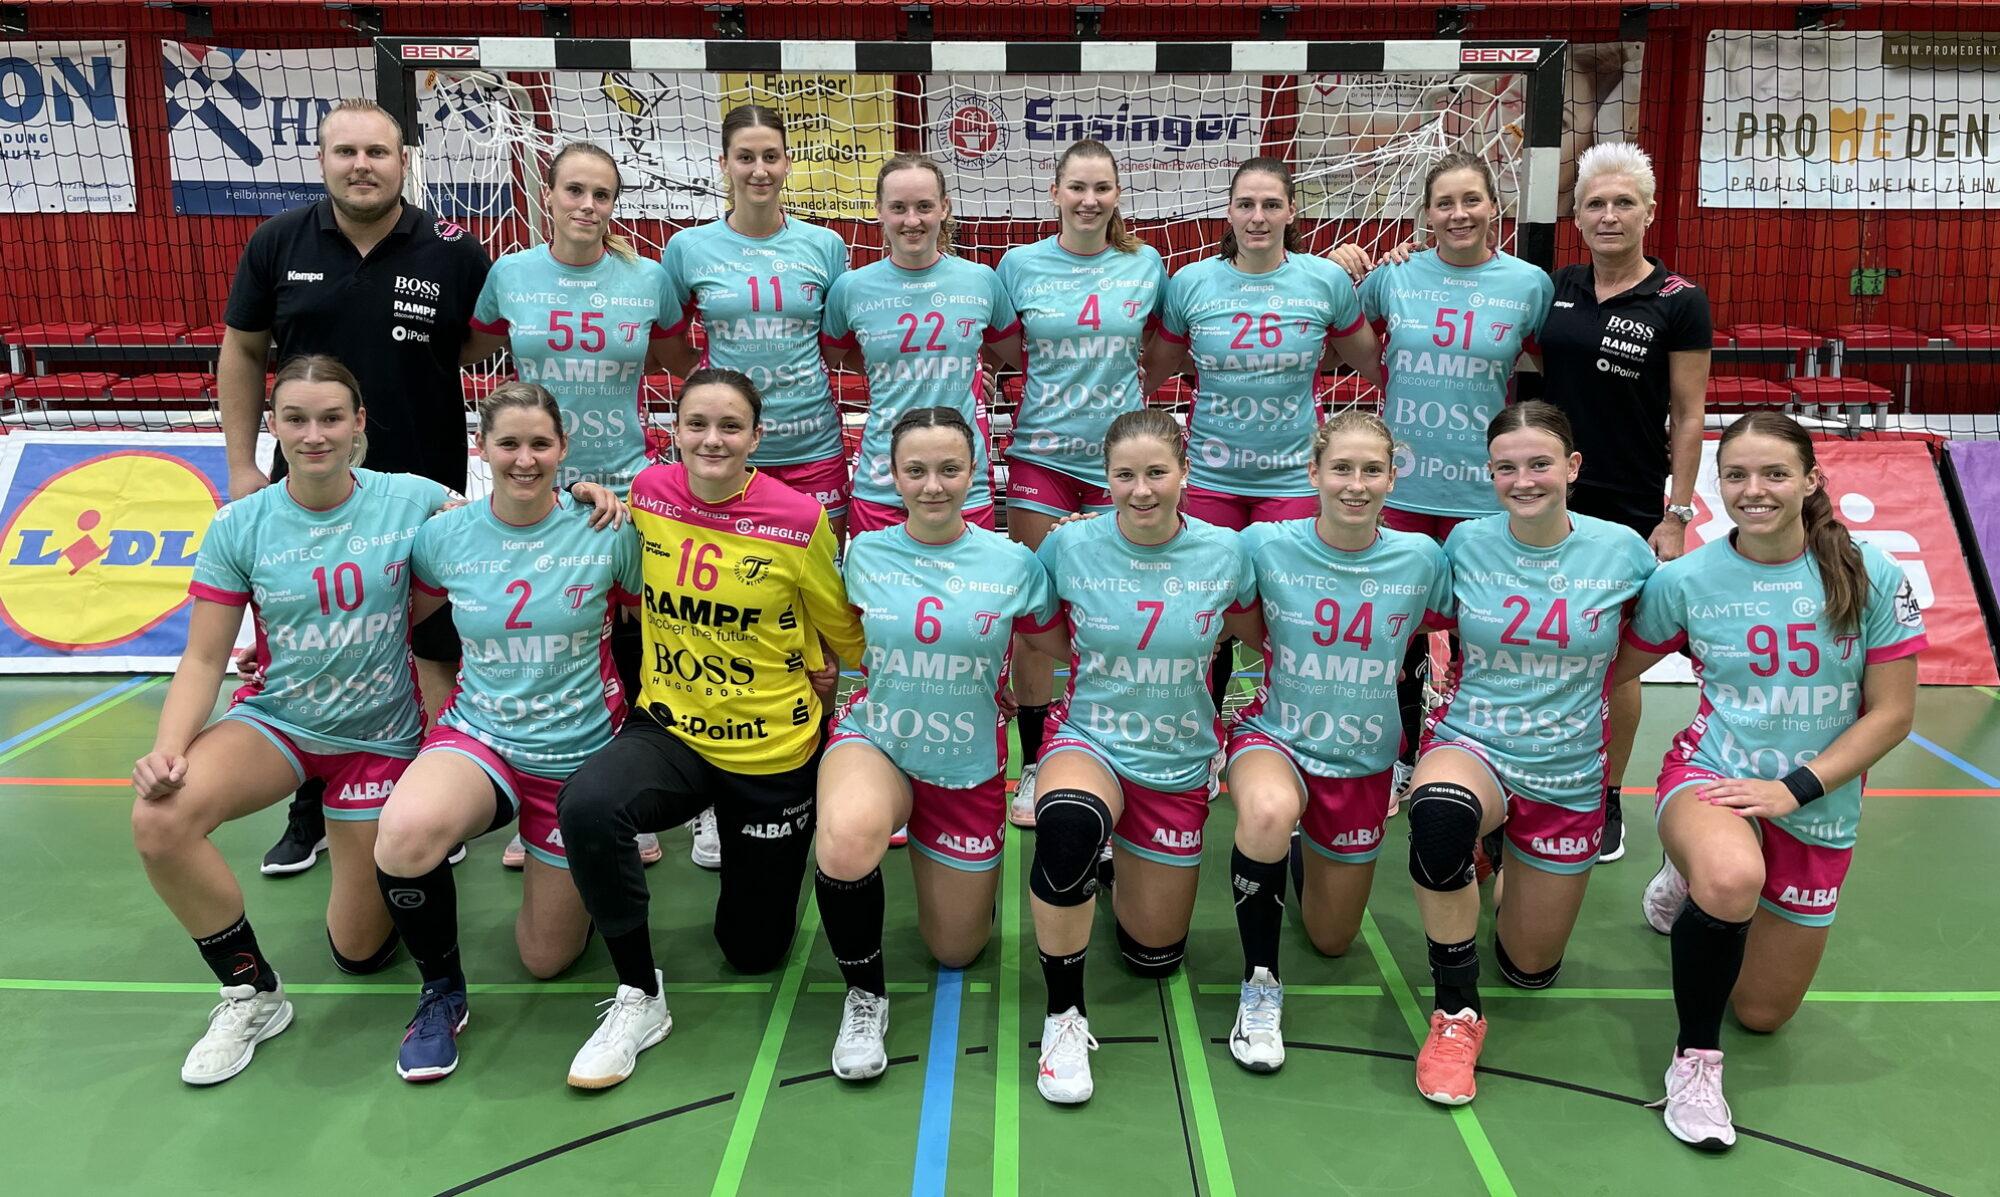 35. Stadtwerk Cup // 13. - 15. August 2021